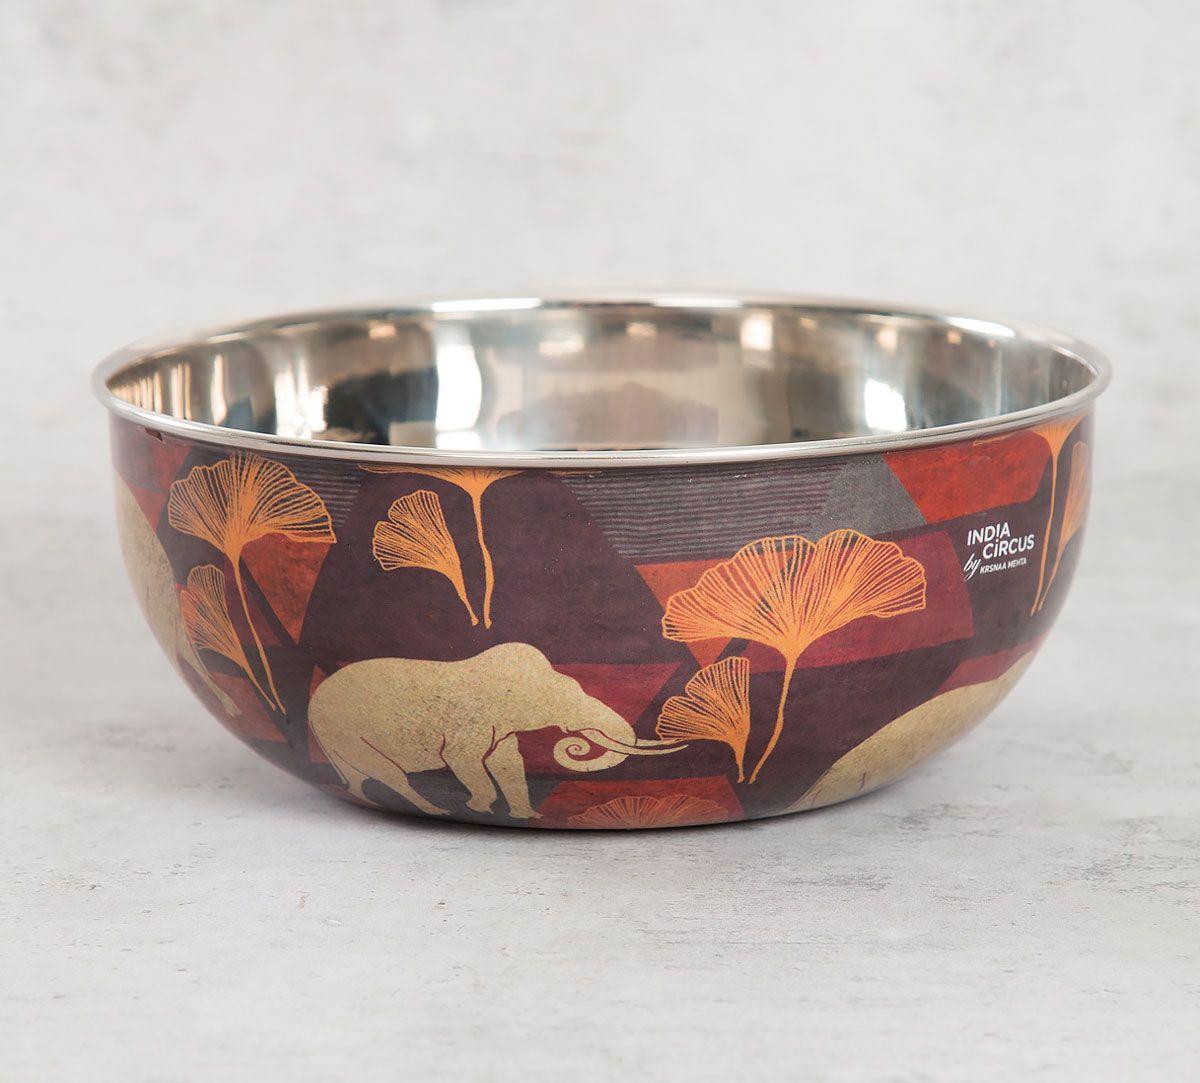 India Circus Gallant Tusker Serving Bowl